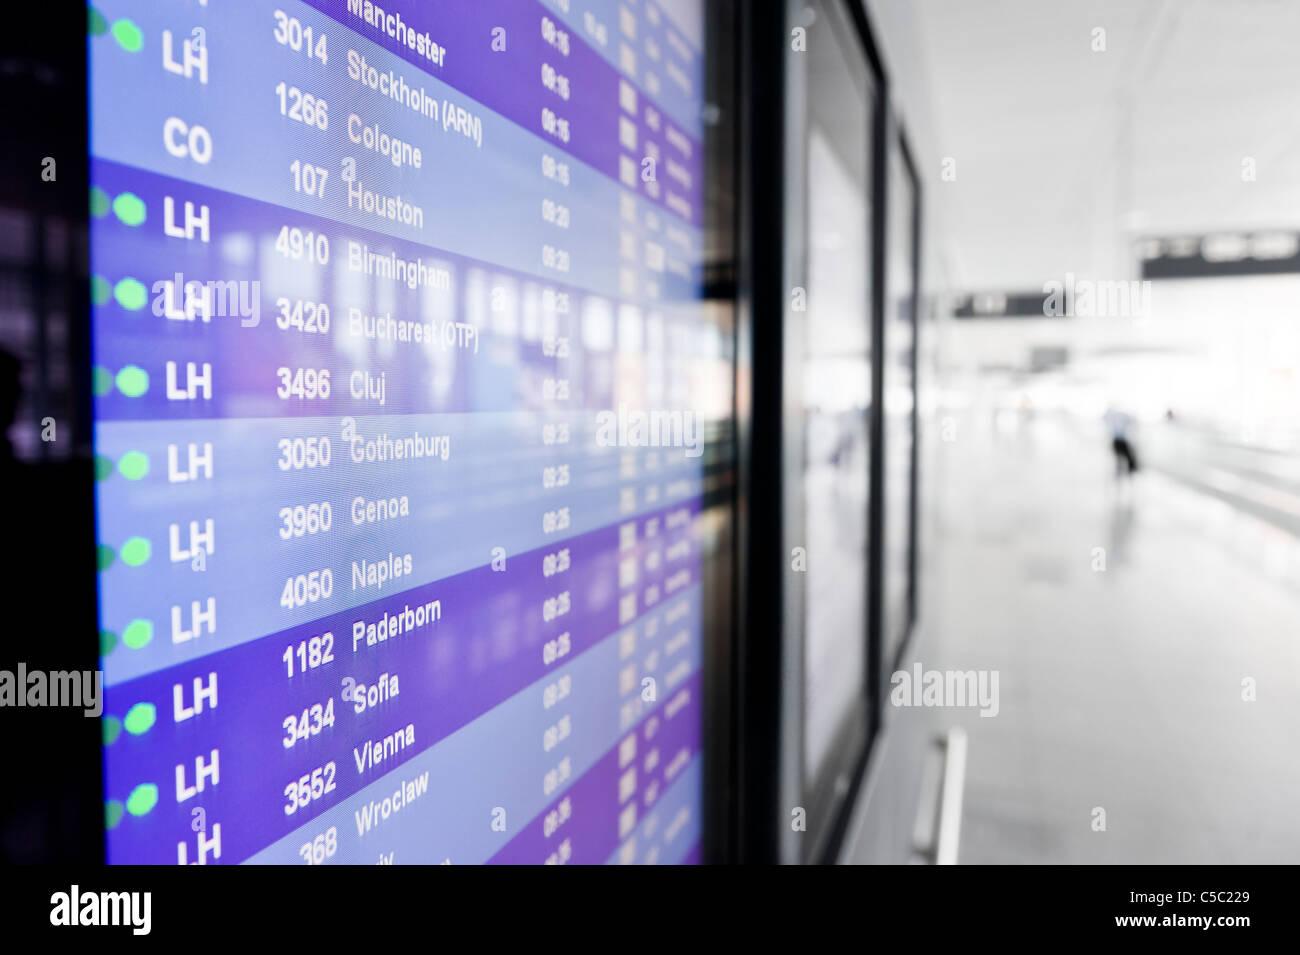 Nahaufnahme eines Flughafen Ankunft und Abflug Zeitplans Stockbild